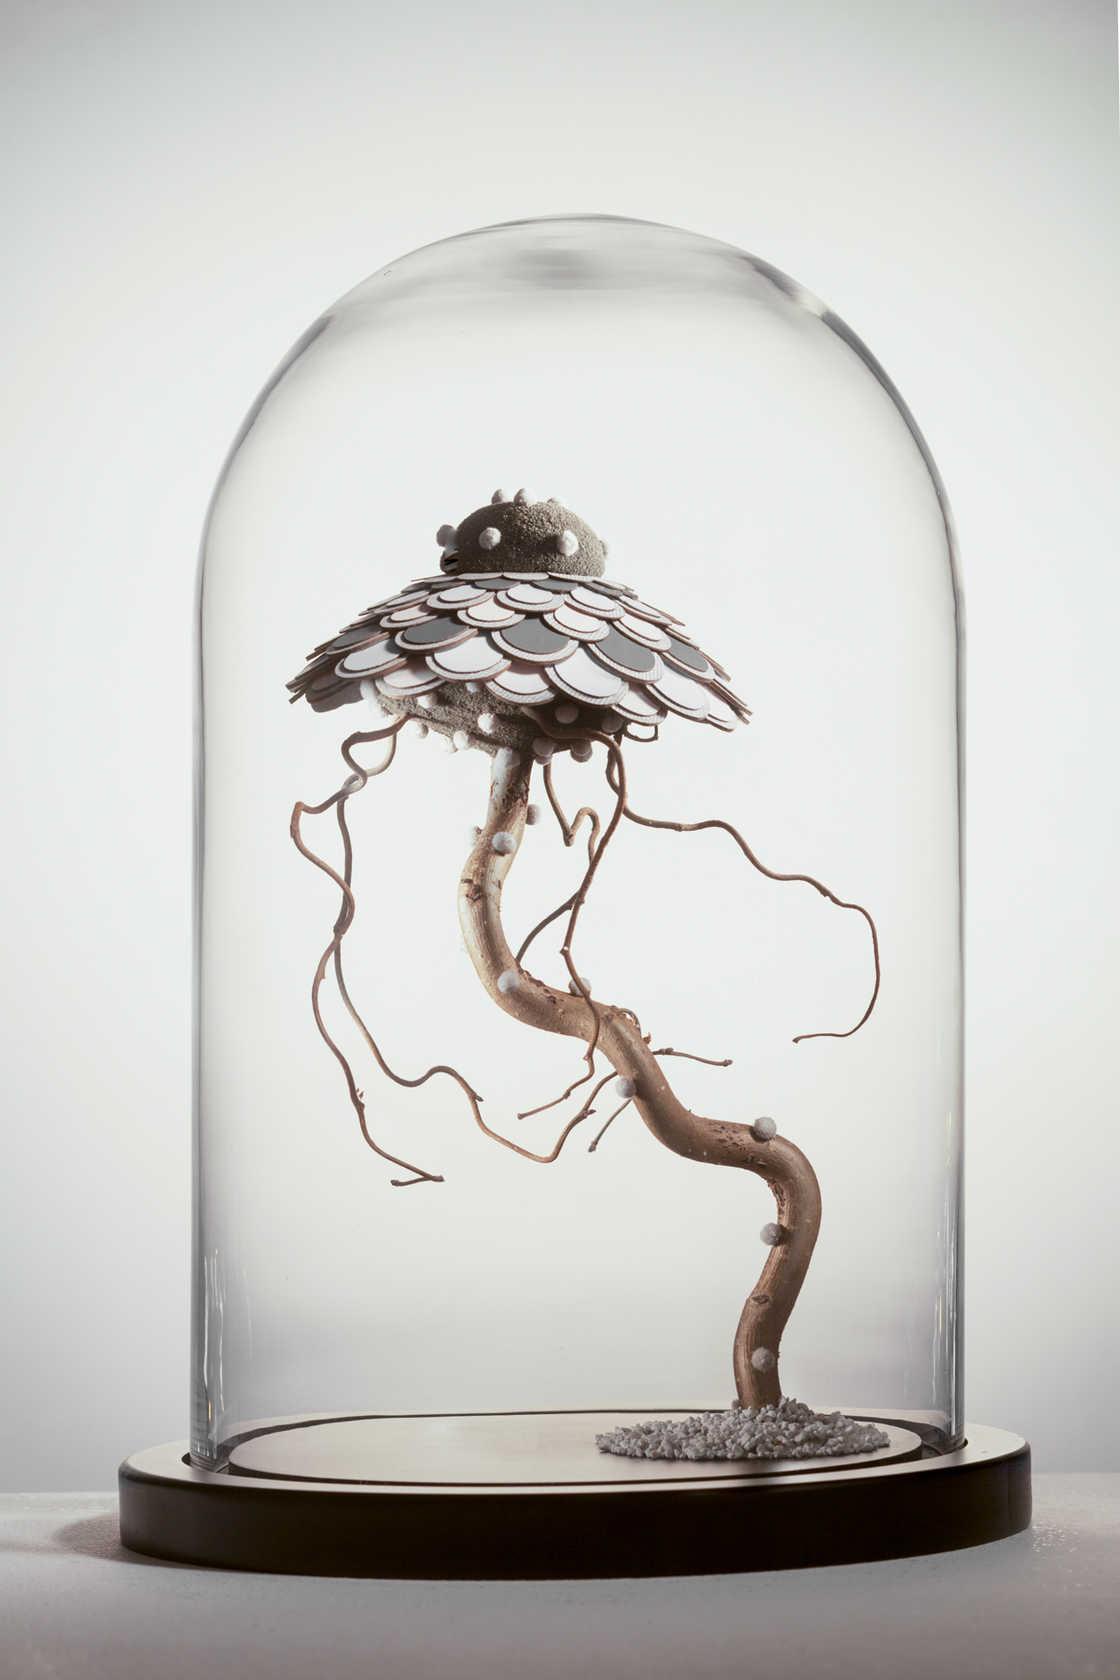 The strange feathered creatures of Noreen Loh Hui Miun